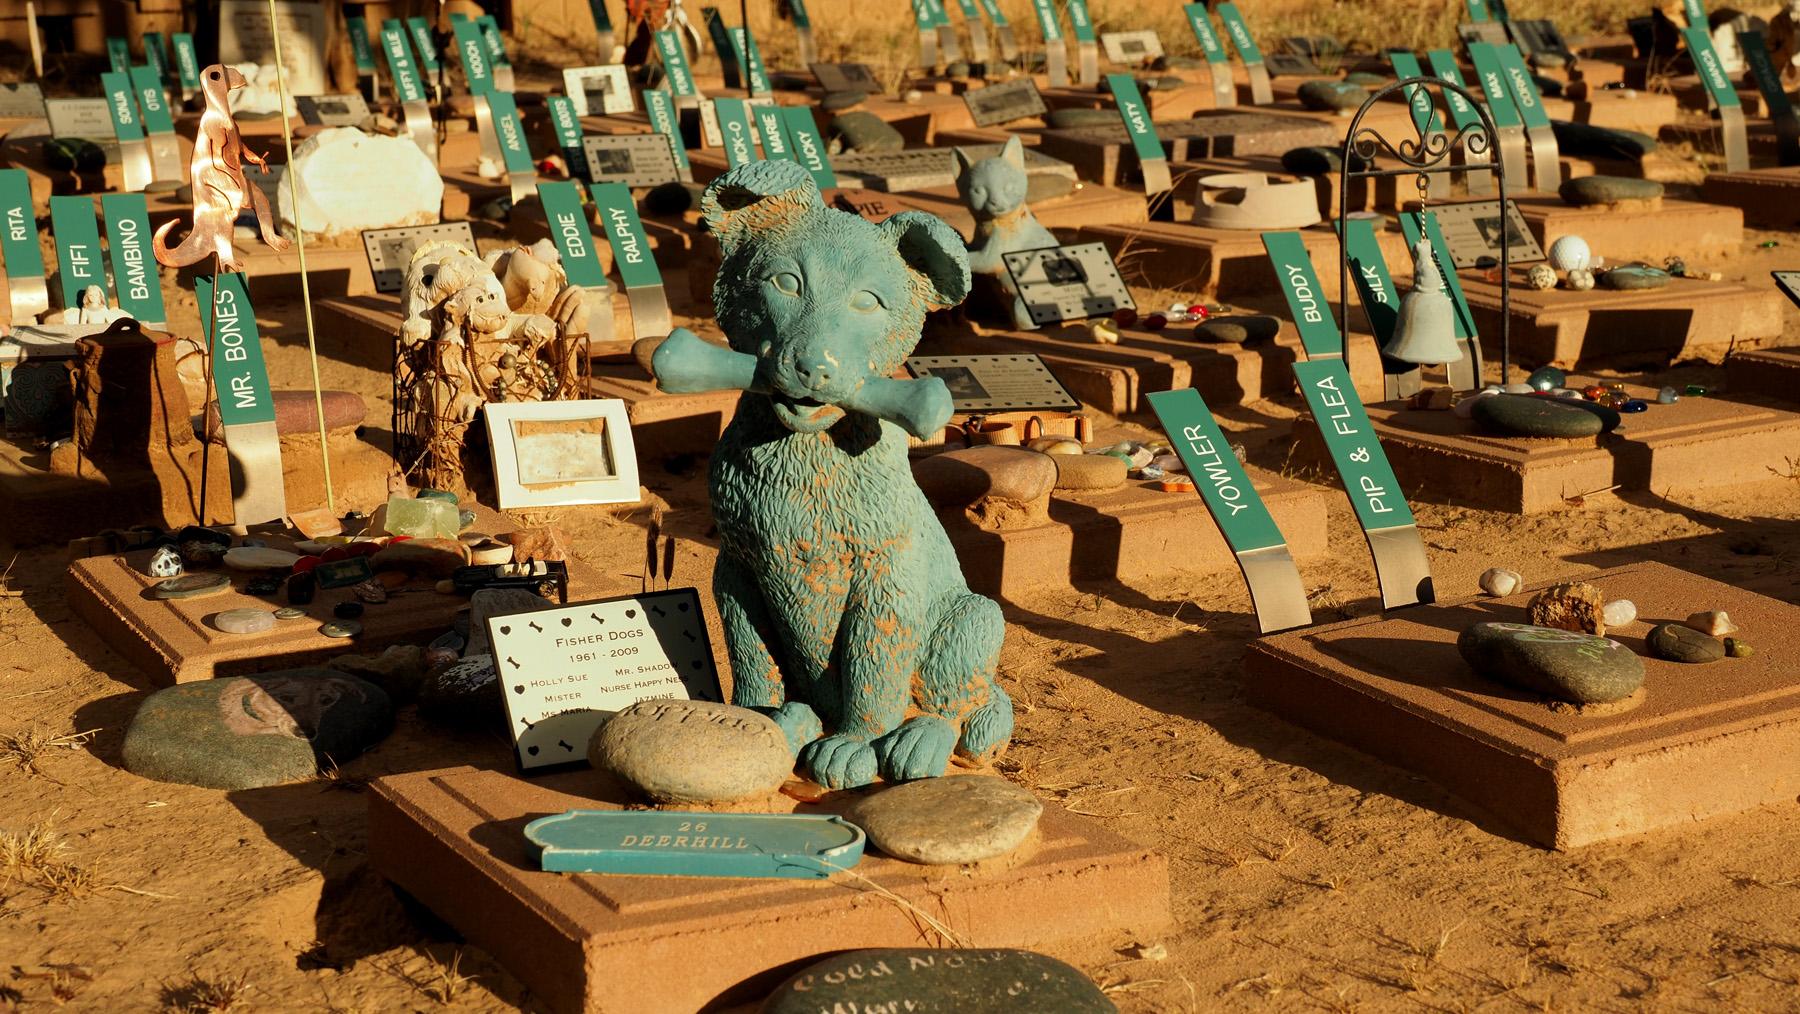 Tierfriedhof Angels Rest